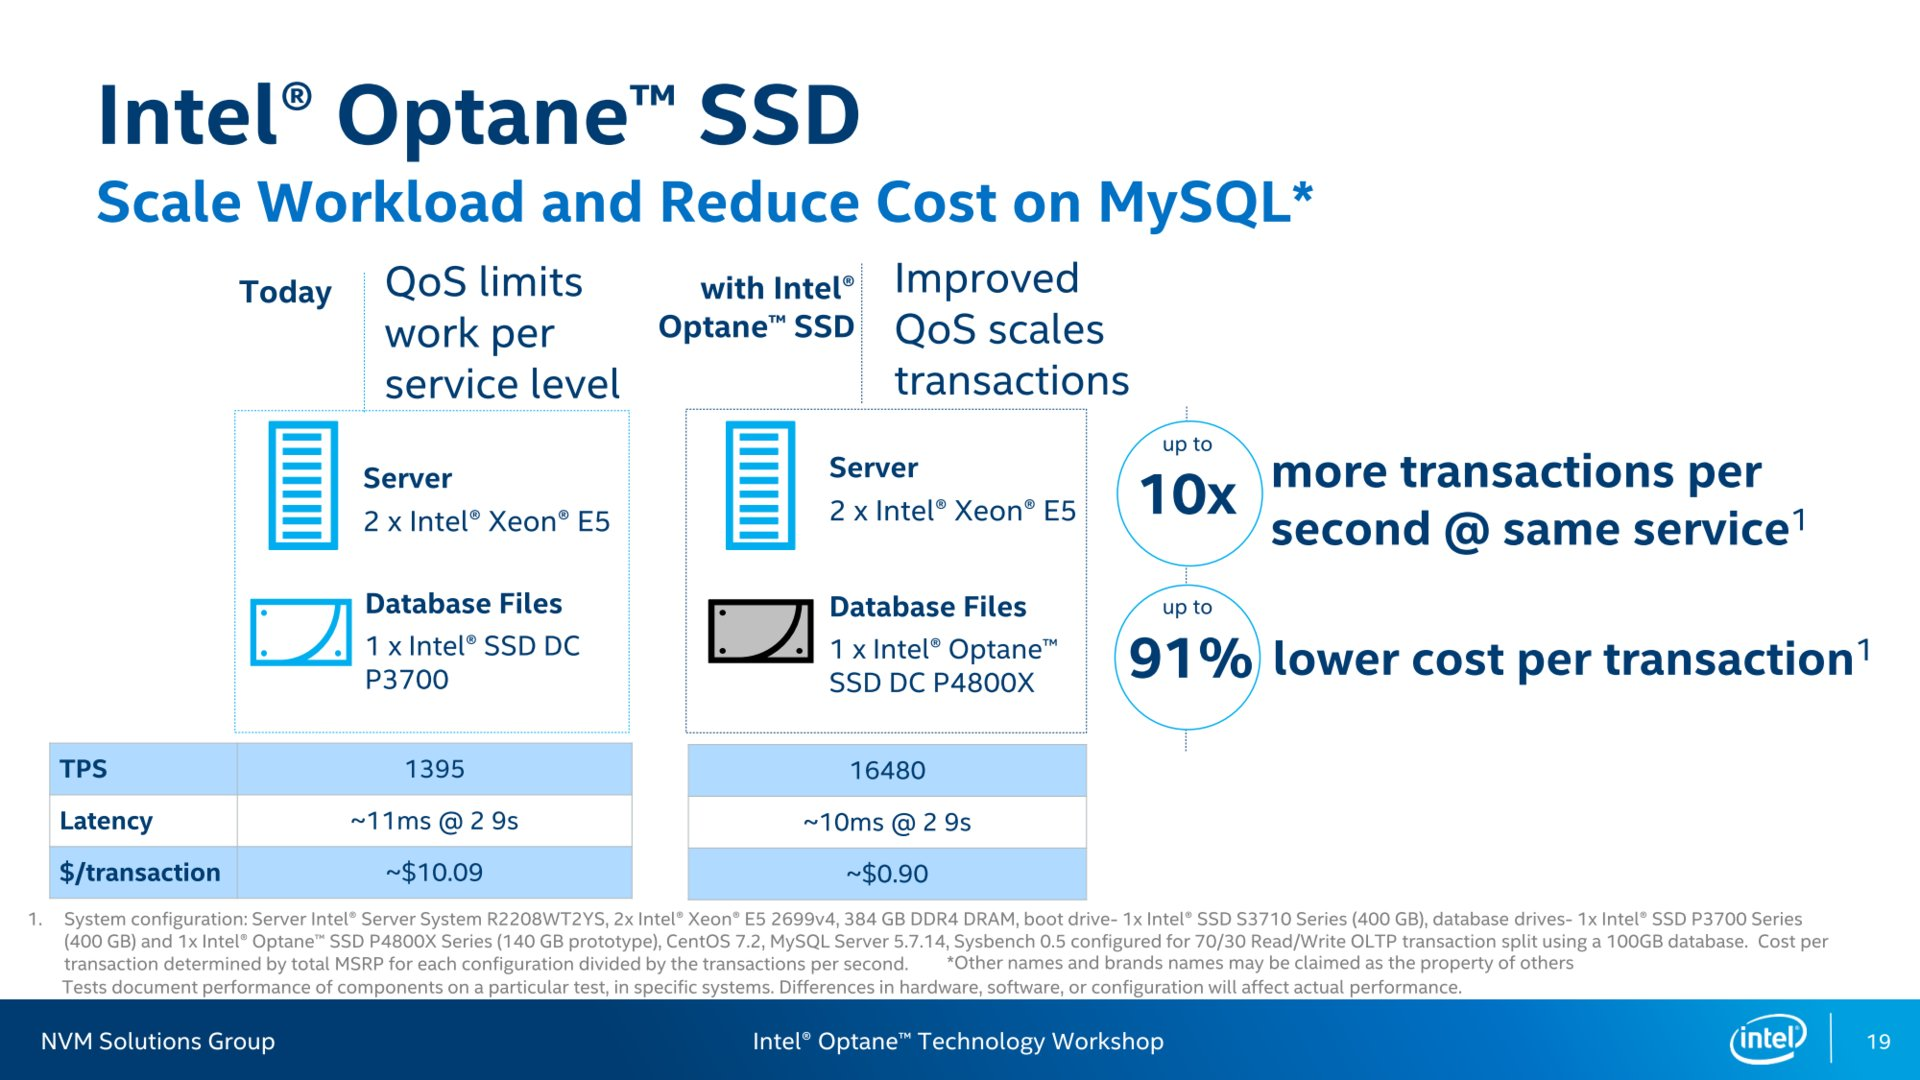 Mehr Transaktionen pro Sekunde bei MySQL